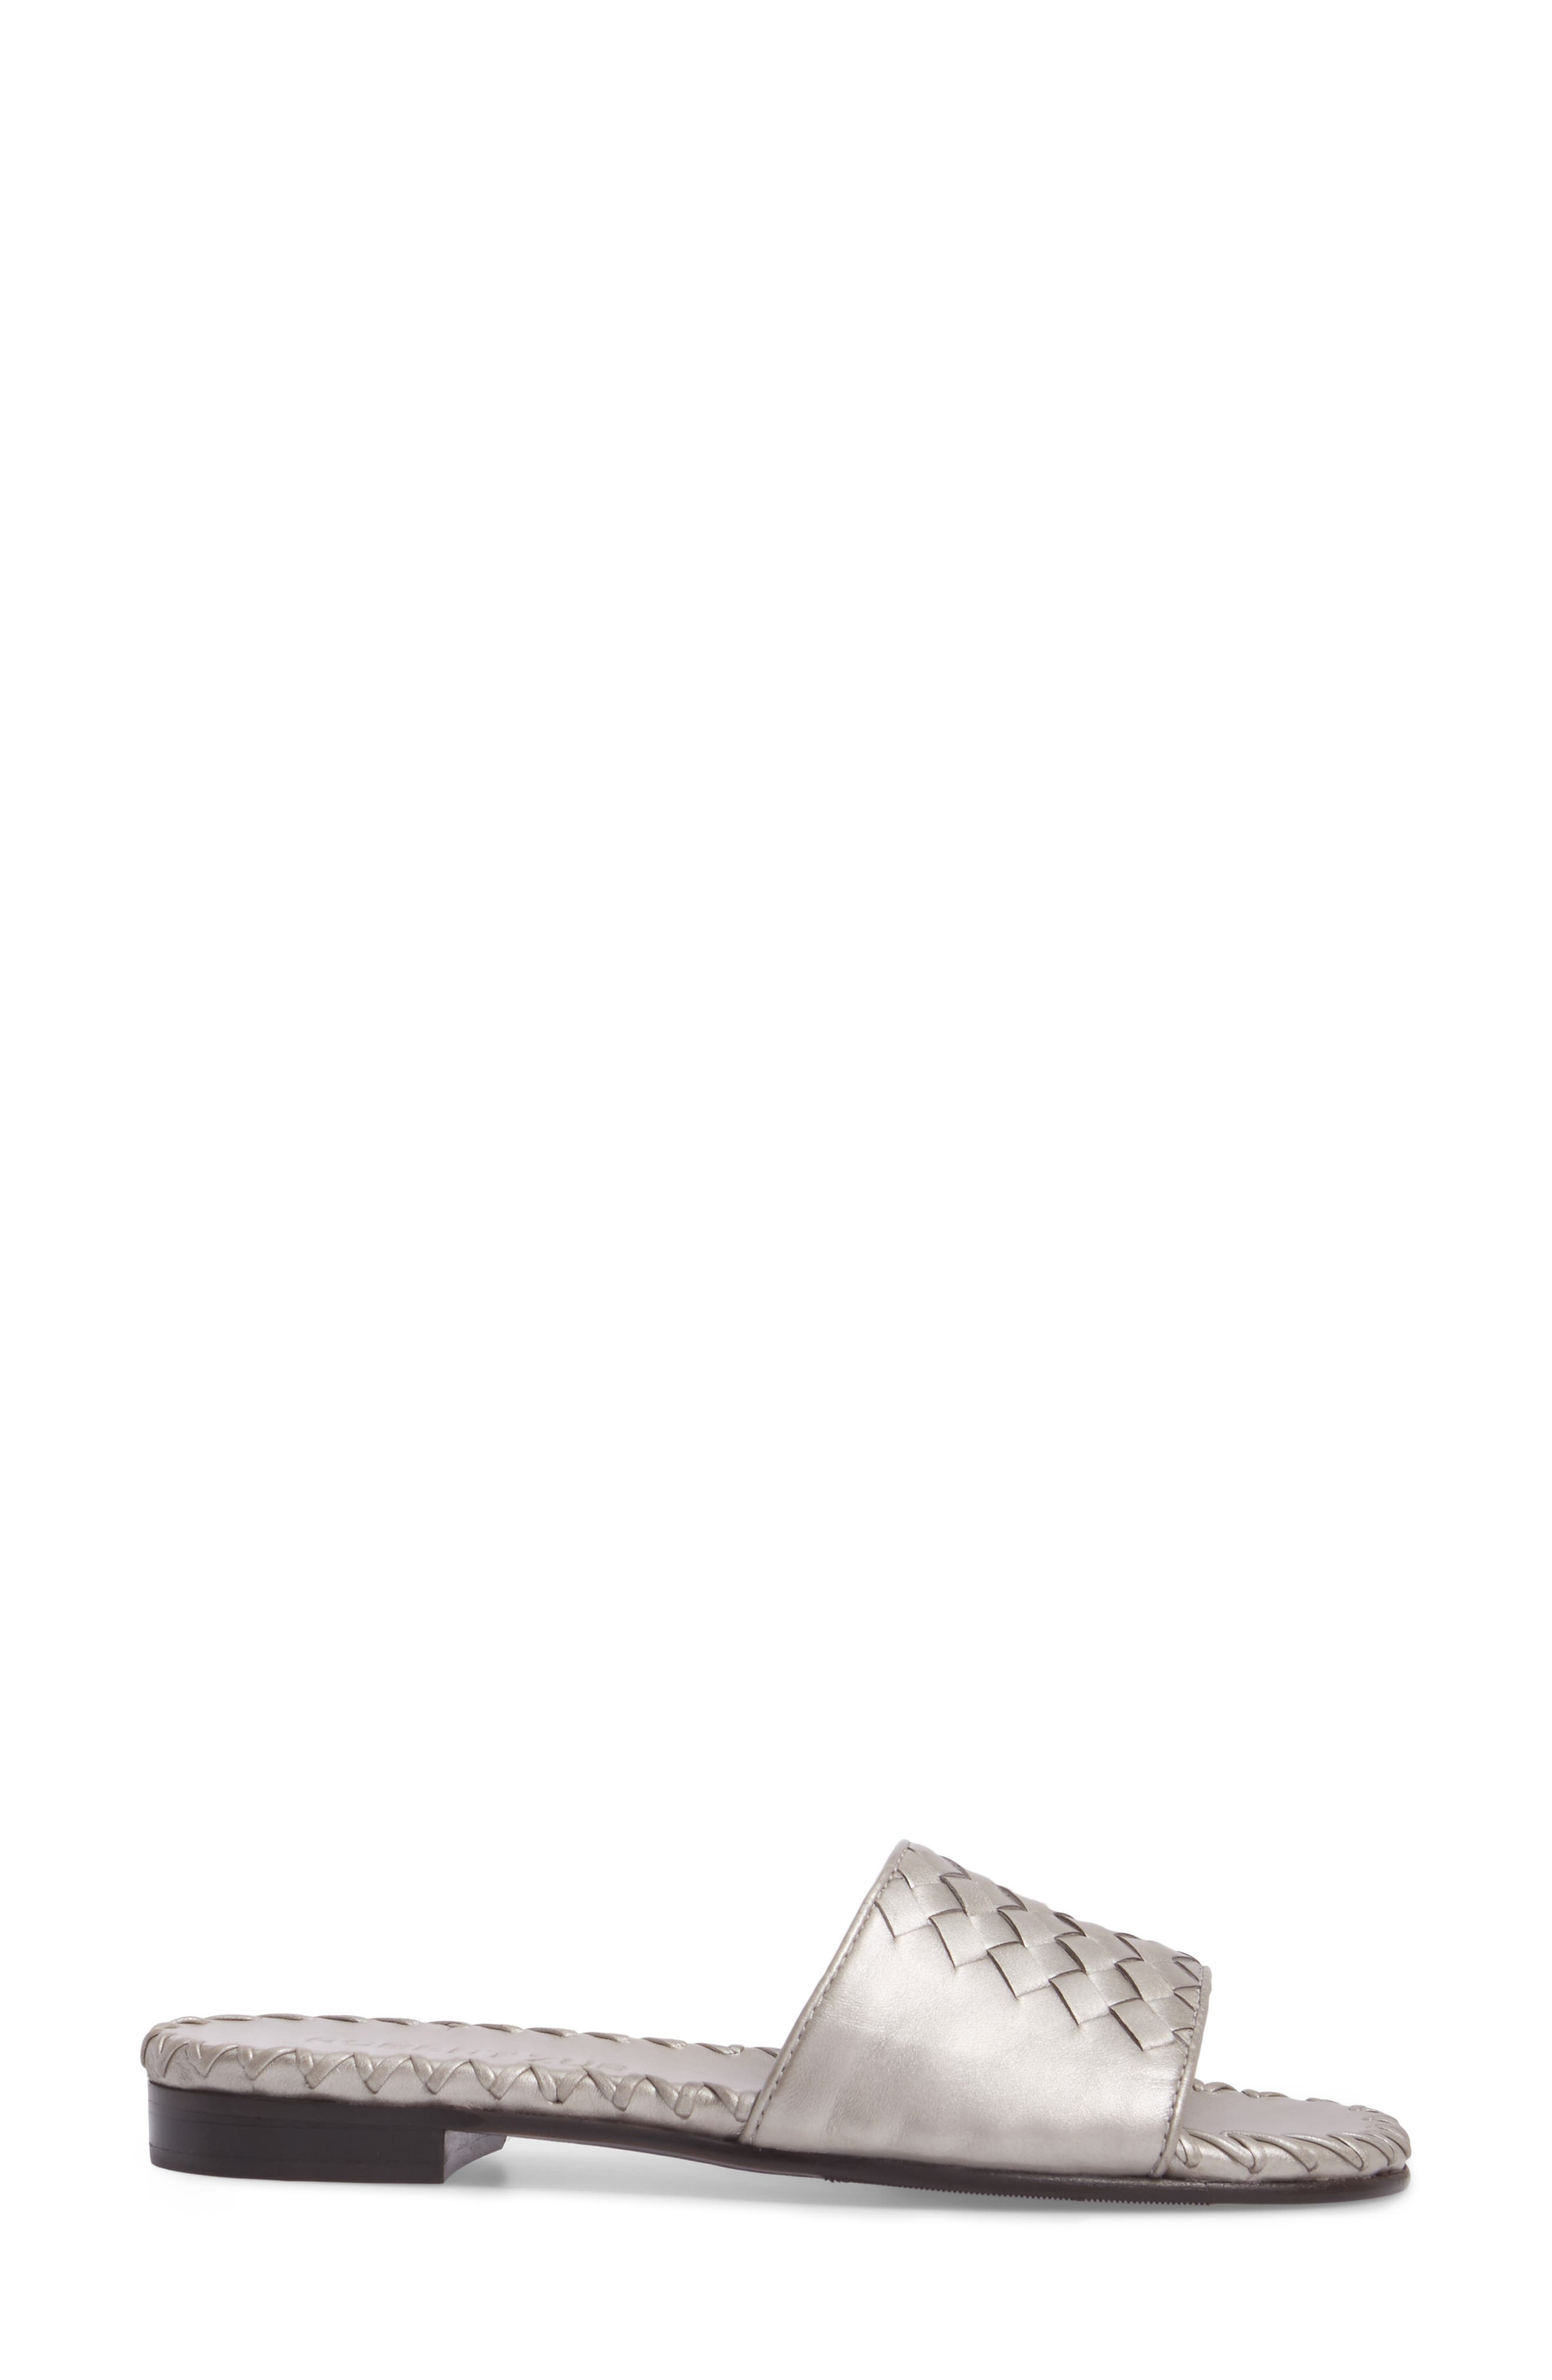 Matilda Woven Slide Sandal,                             Alternate thumbnail 3, color,                             Silver